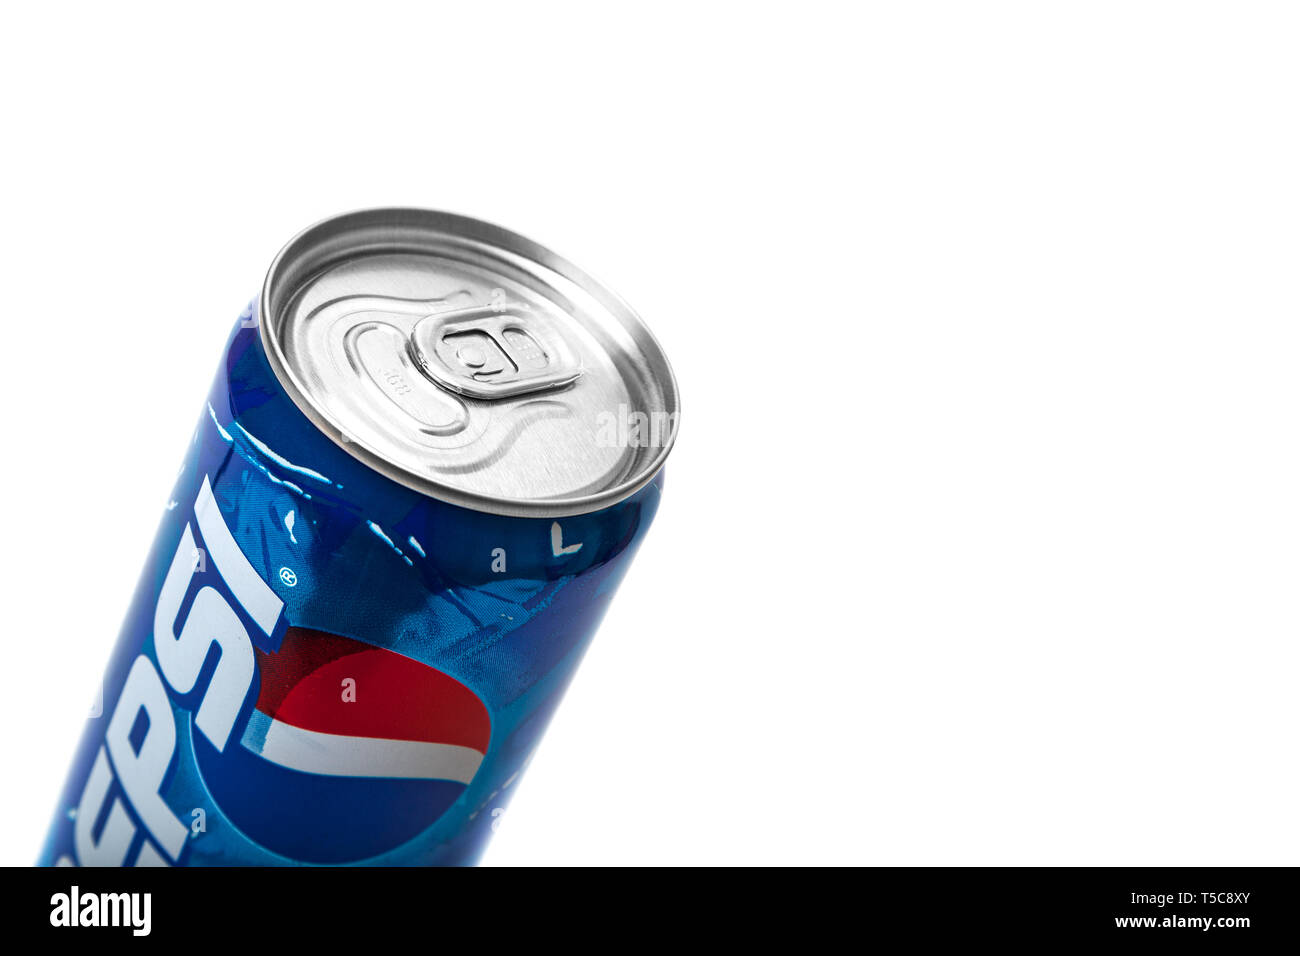 CHISINAU, MOLDOVA - APRIL 21, 2019: Pepsi cola 2000s soft drink